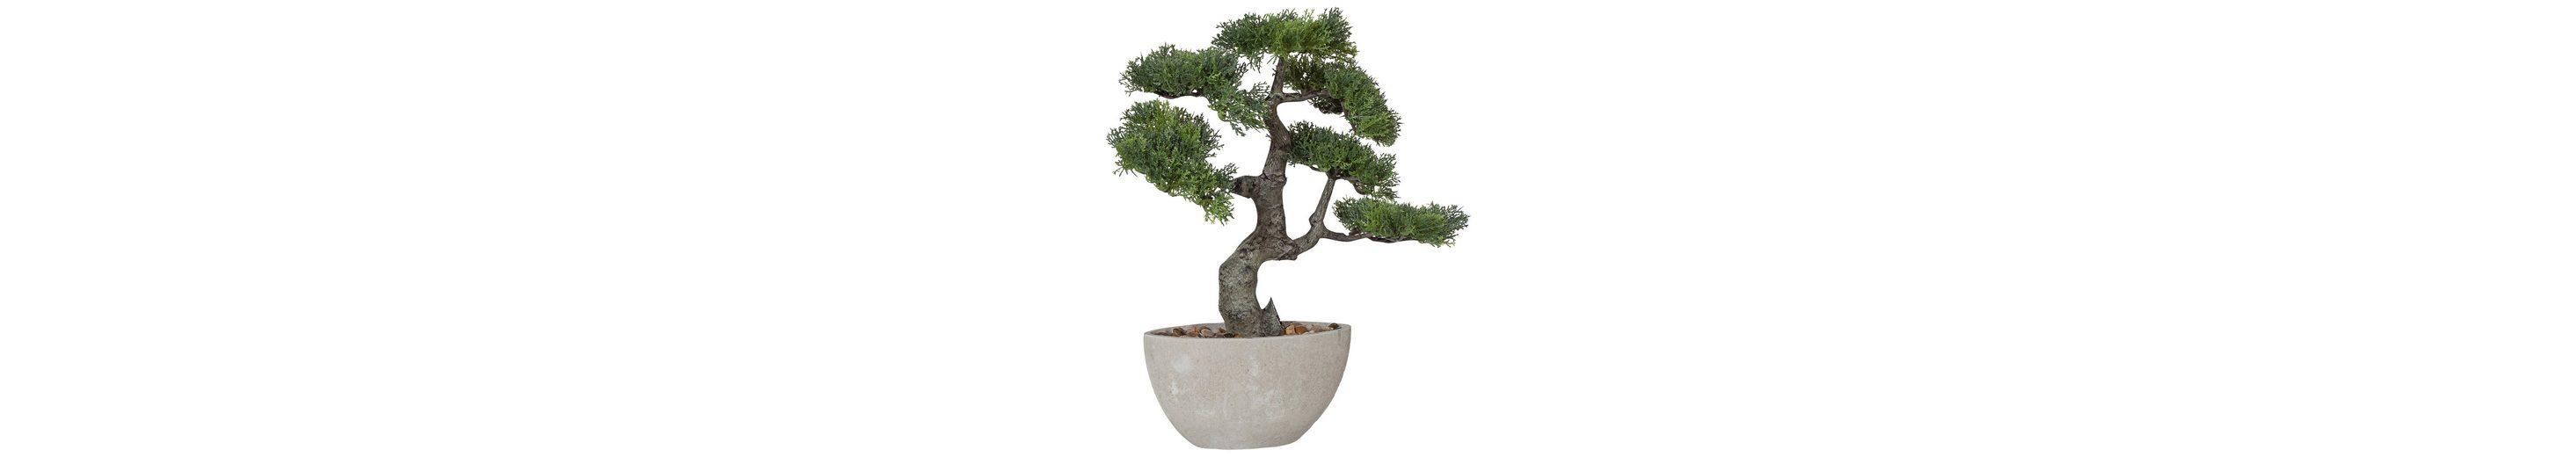 Premium collection by Home affaire Kunstpflanze »Bonsai«